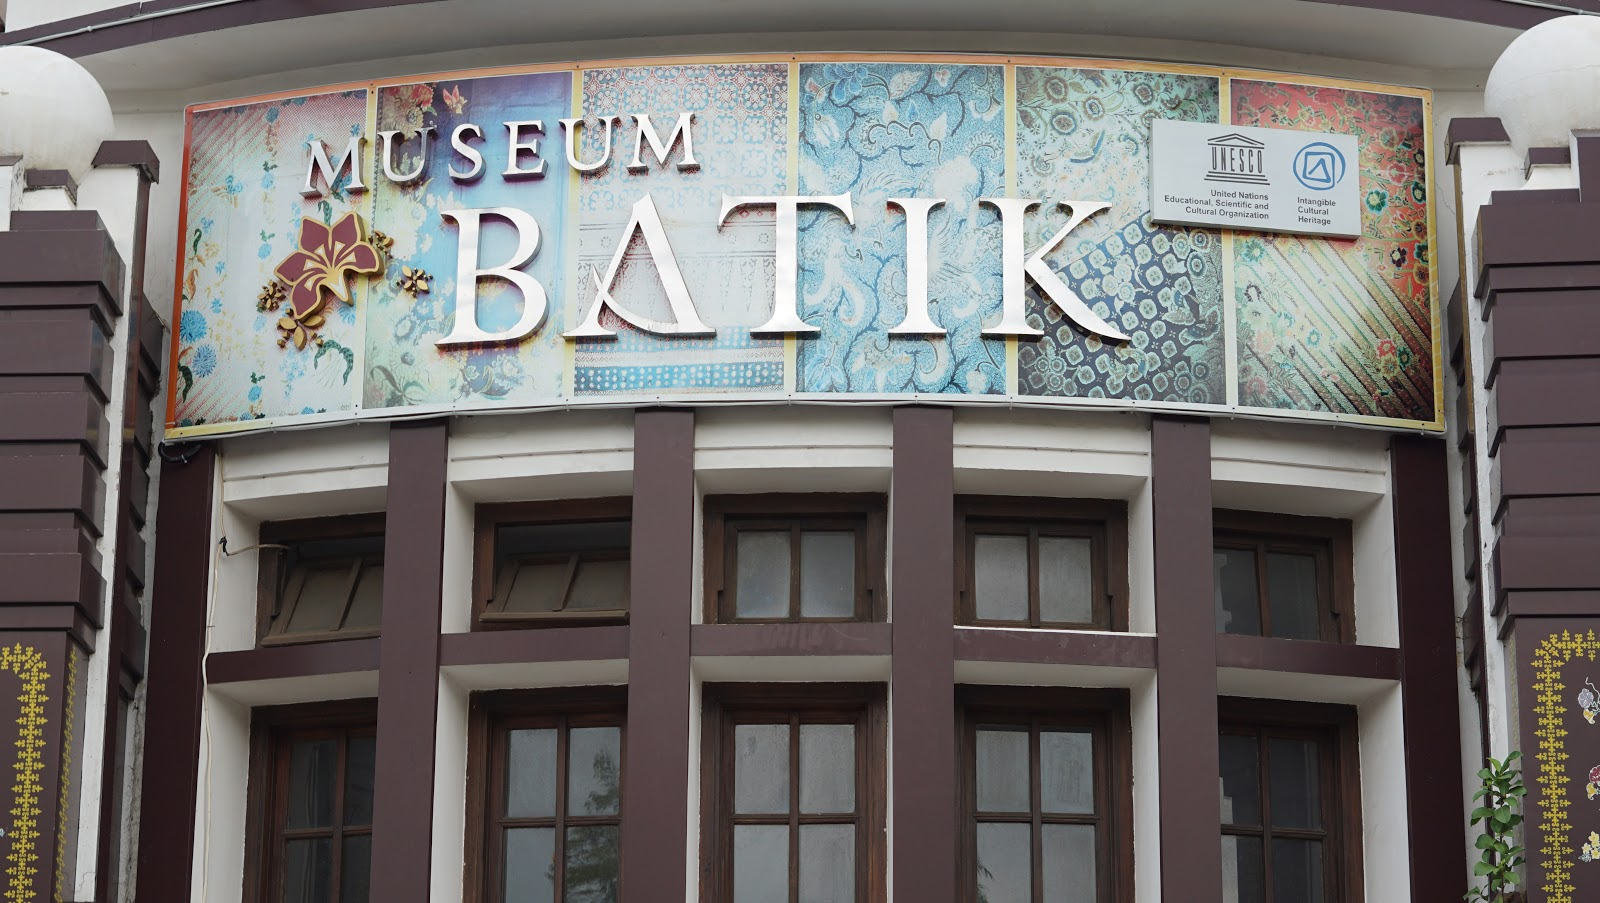 Sejarah Kota Pekalongan Disebut Kota Batik 4